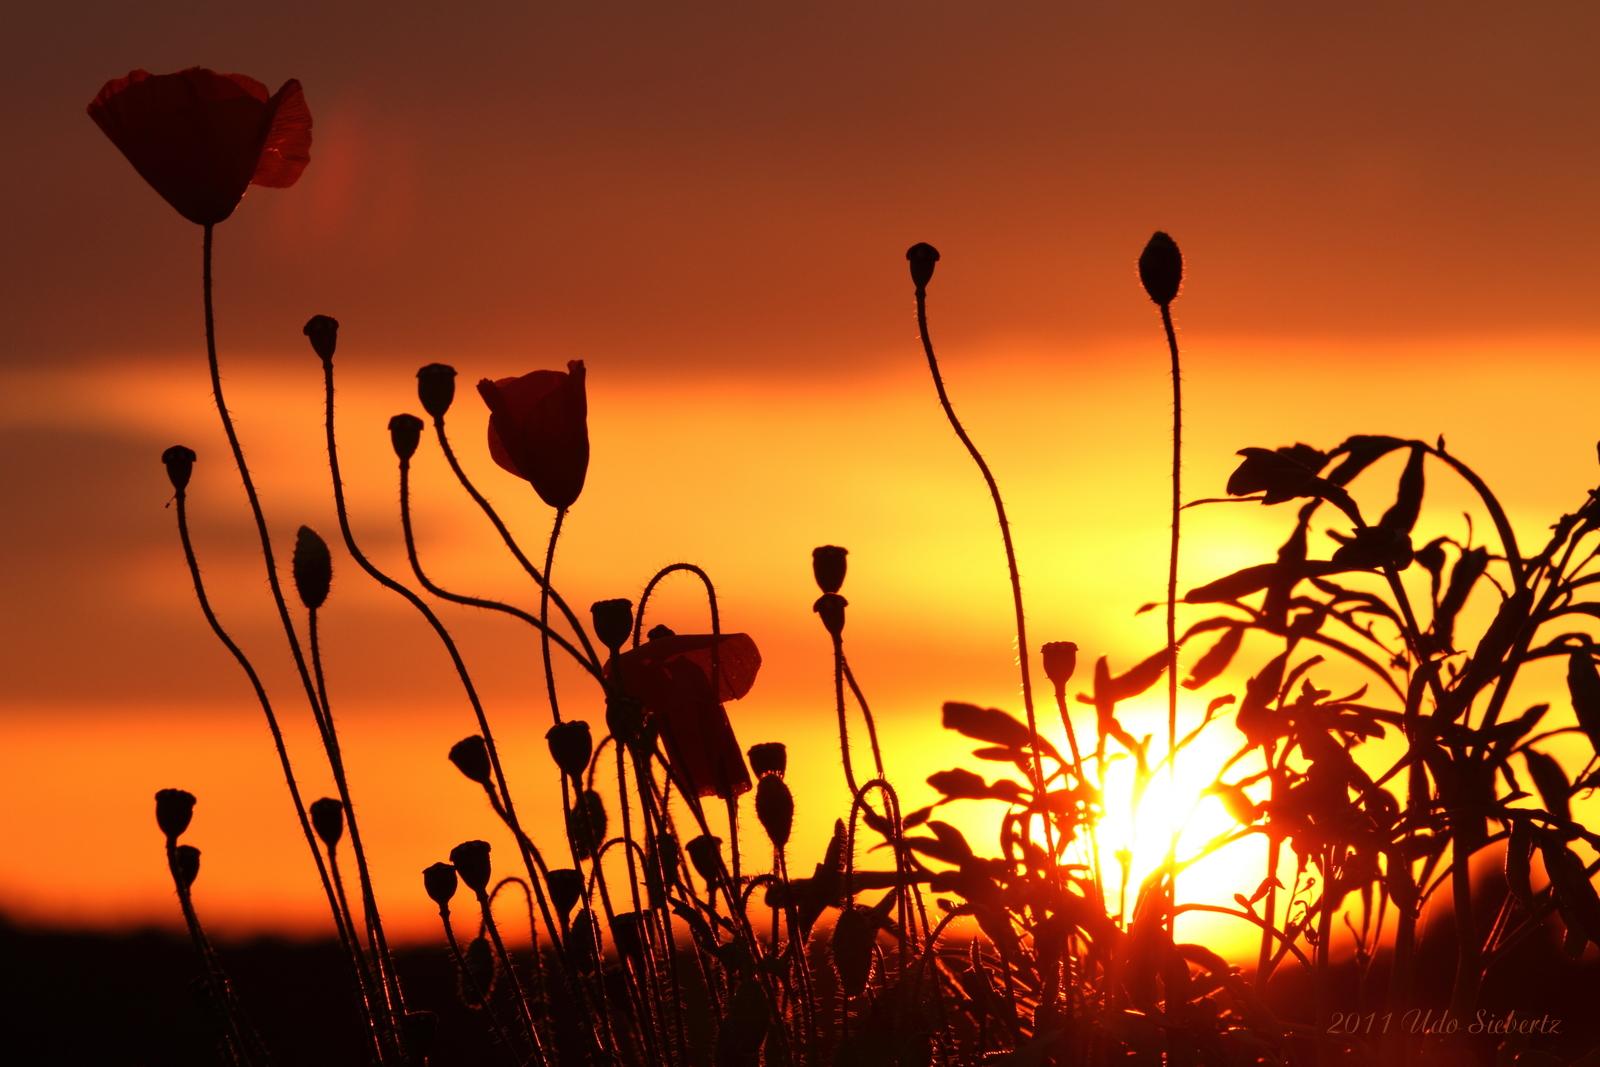 Mohnblumen im Sonnenuntergang